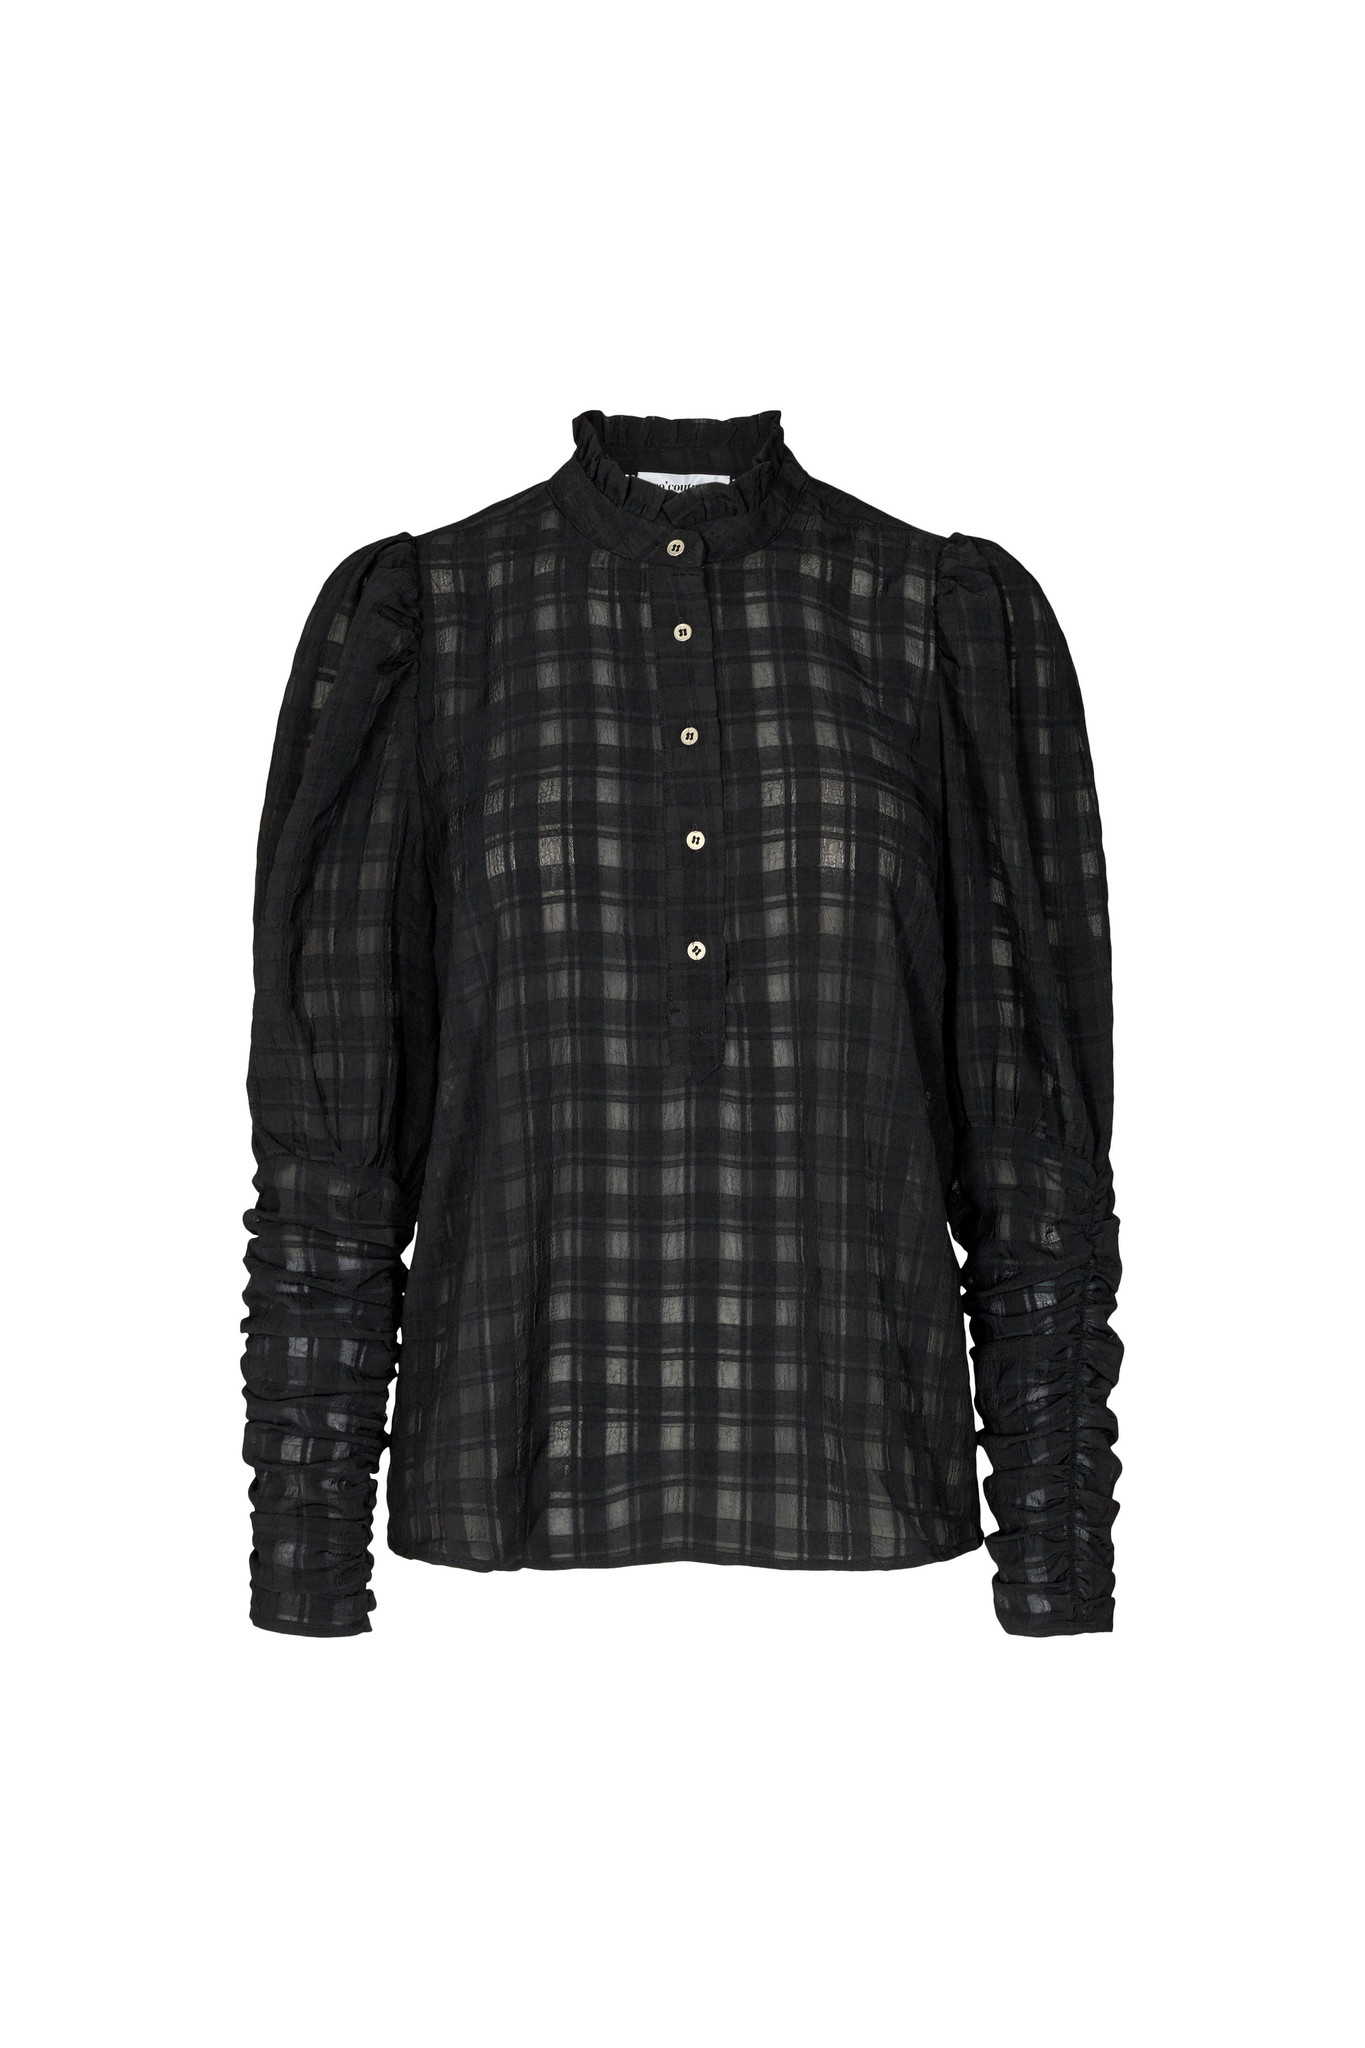 Rowland Puff Sleeve Shirt - Black-1